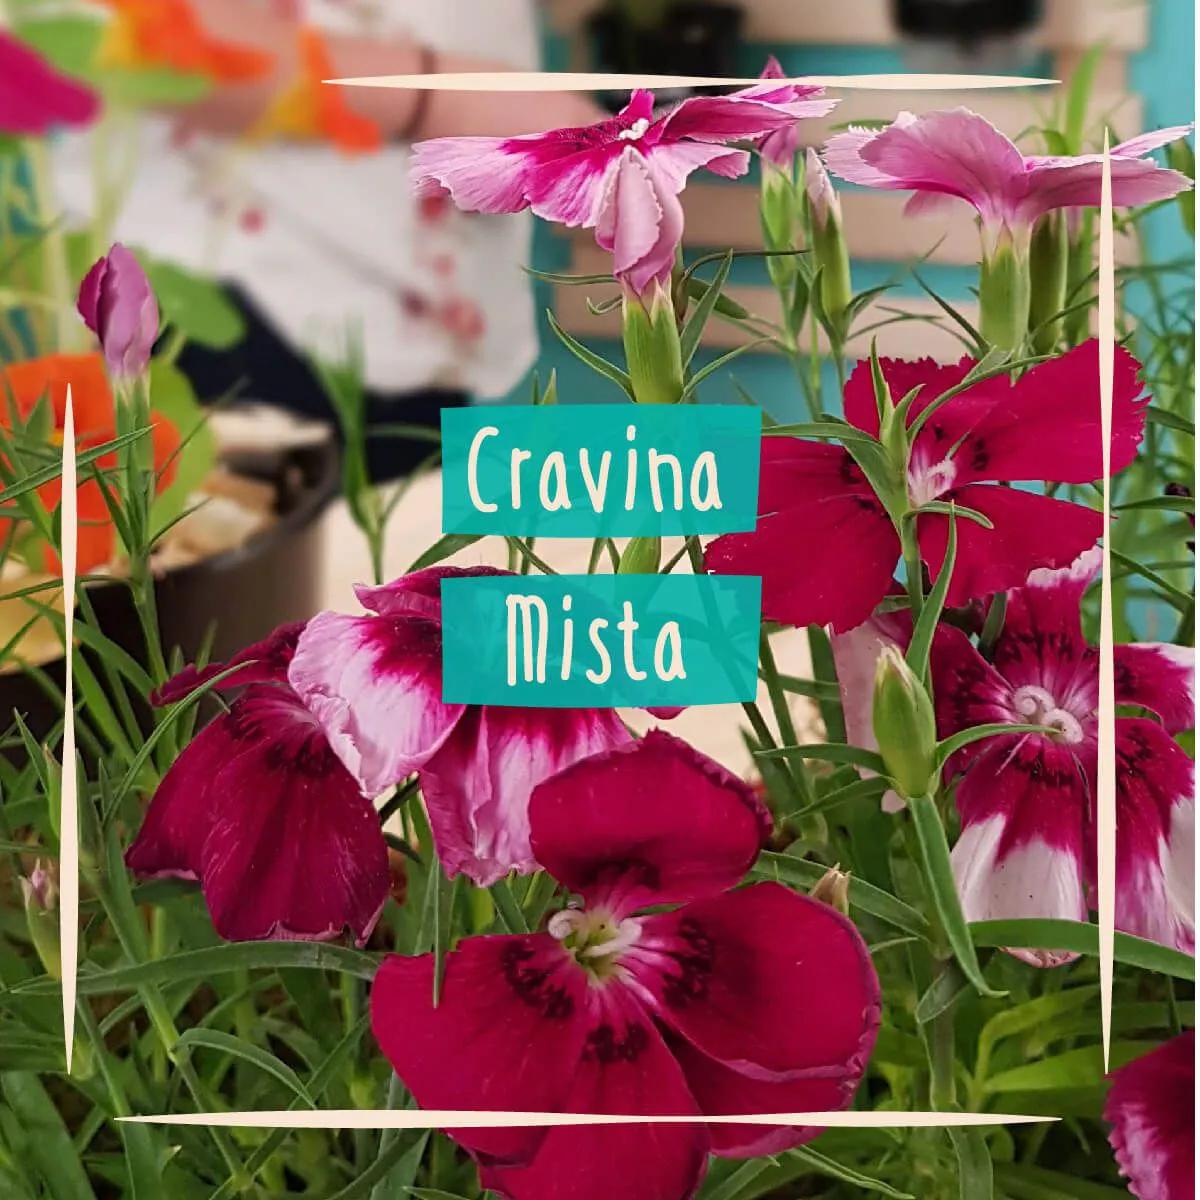 Sementes para plantar Cravina da China Sortida em vasos autoirrigáveis RAIZ  - Vasos Raiz Loja Oficial